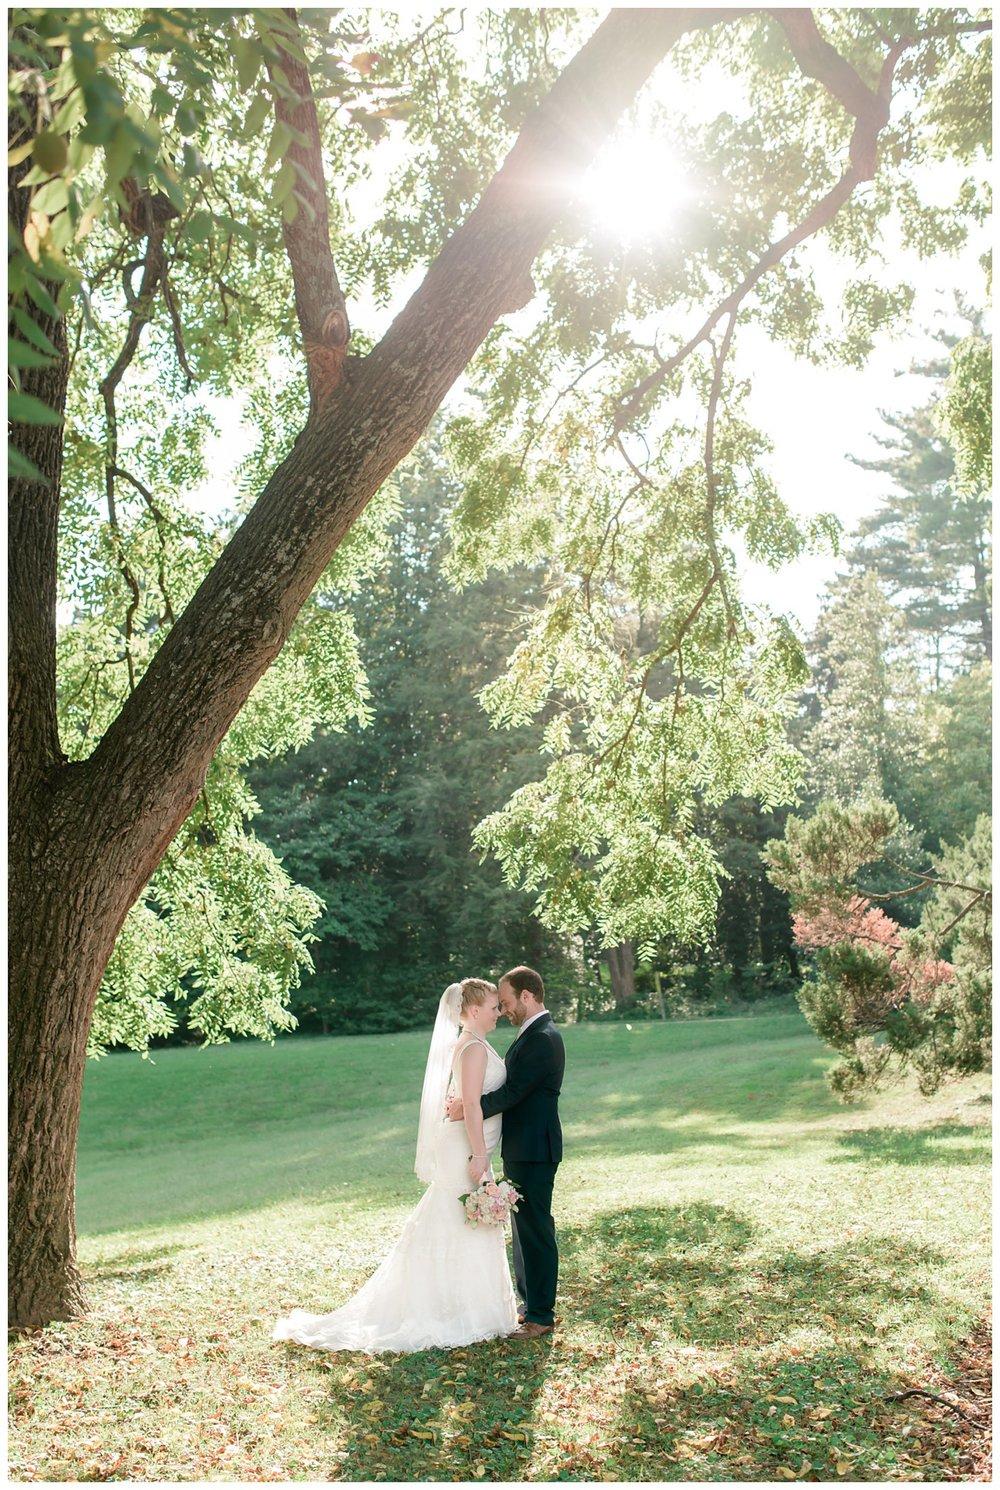 Della and Andrew Wedding Photos_Hendry House Arlington Virginia_Stephanie Kopf Photography_Northern Virginia Wedding Photography-112.jpg